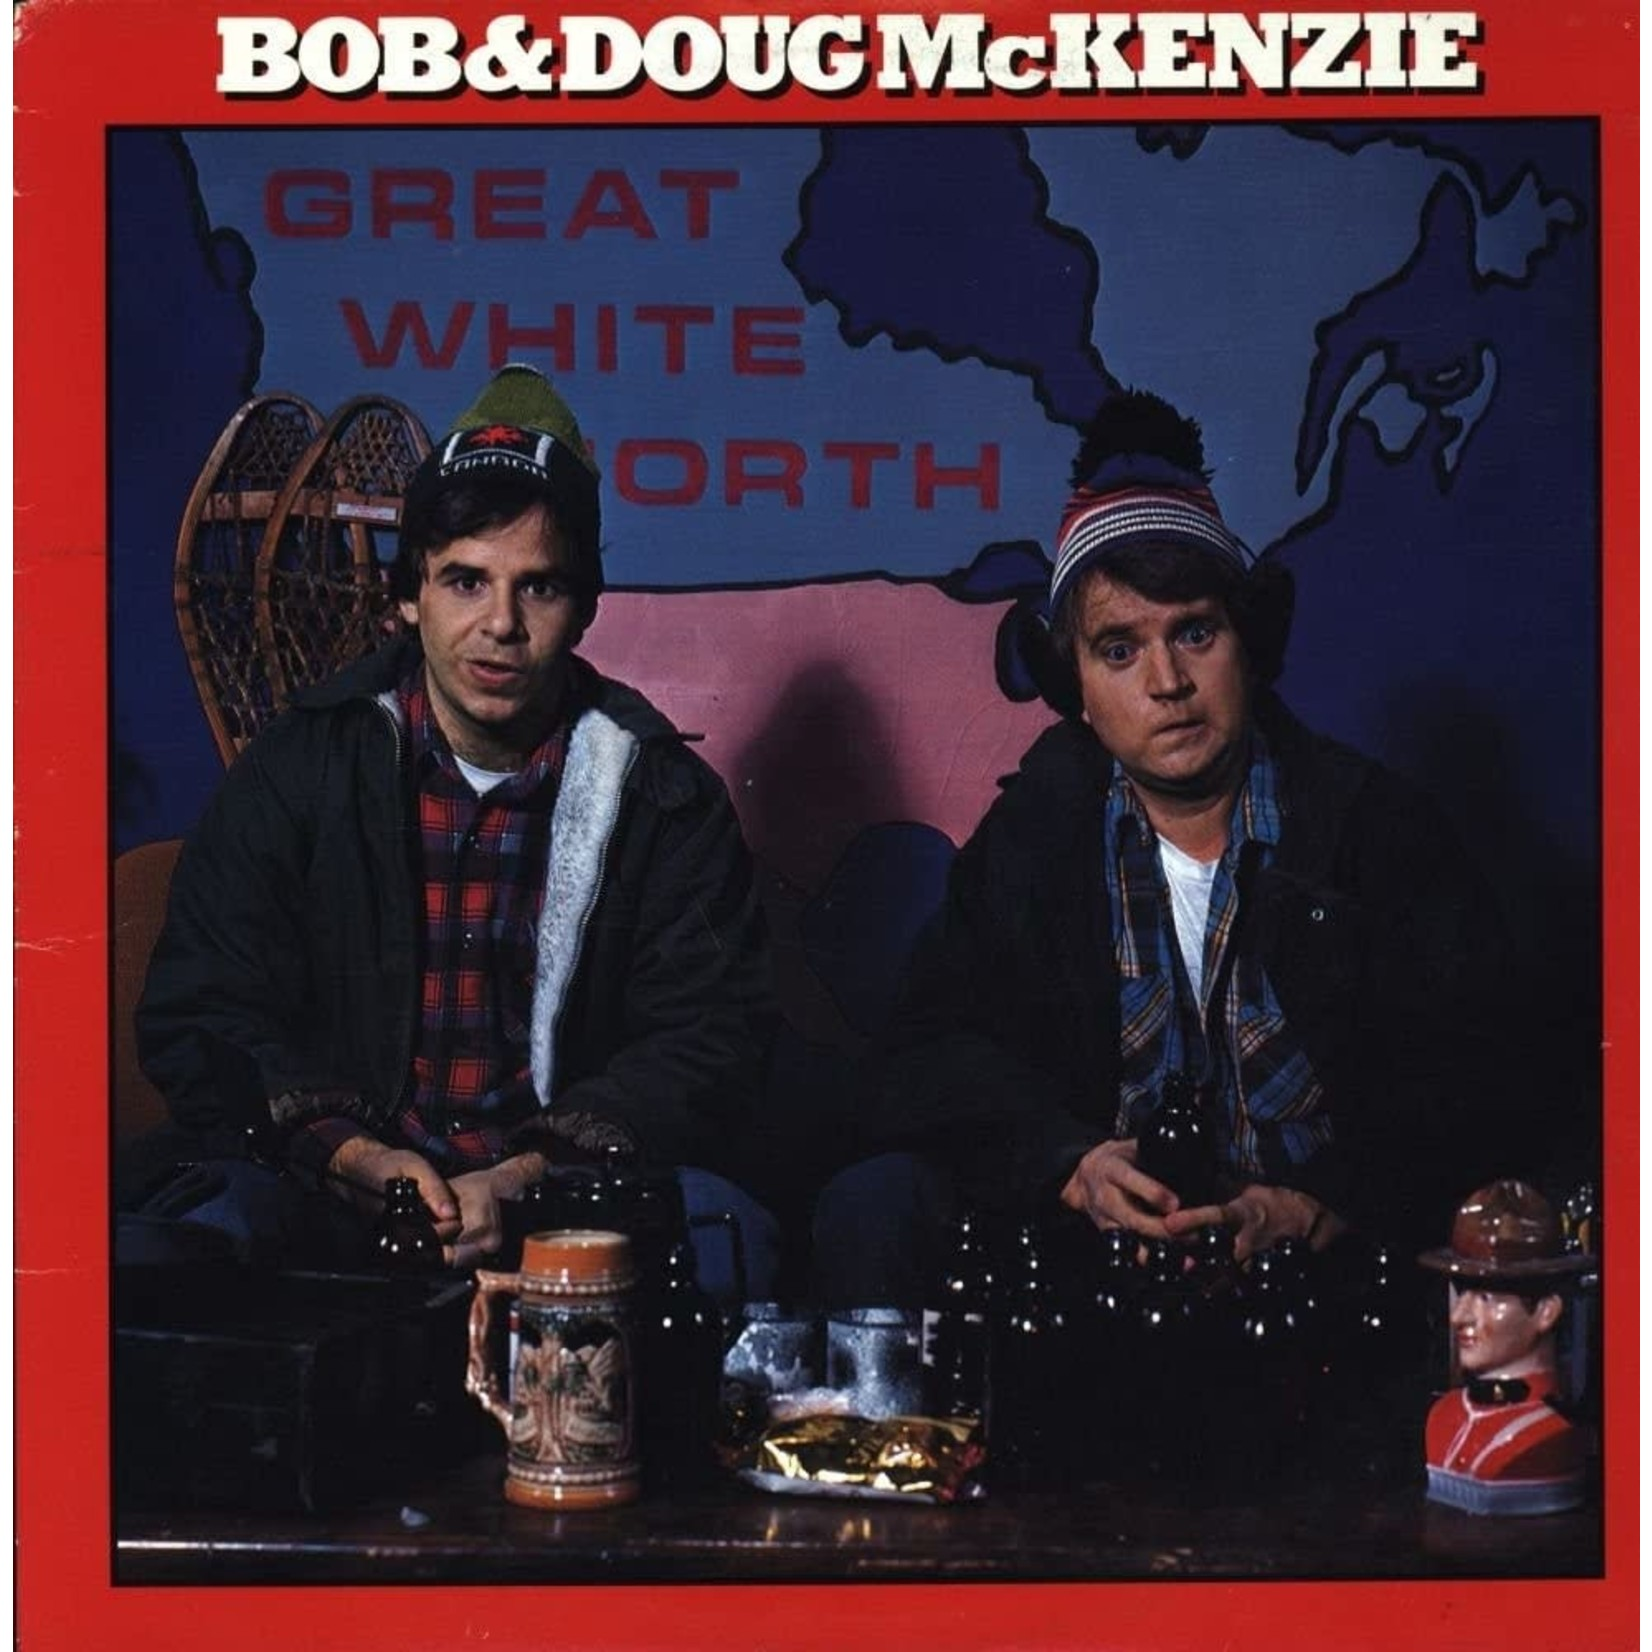 [Vintage] Mckenzie, Bob & Doug: Great White North